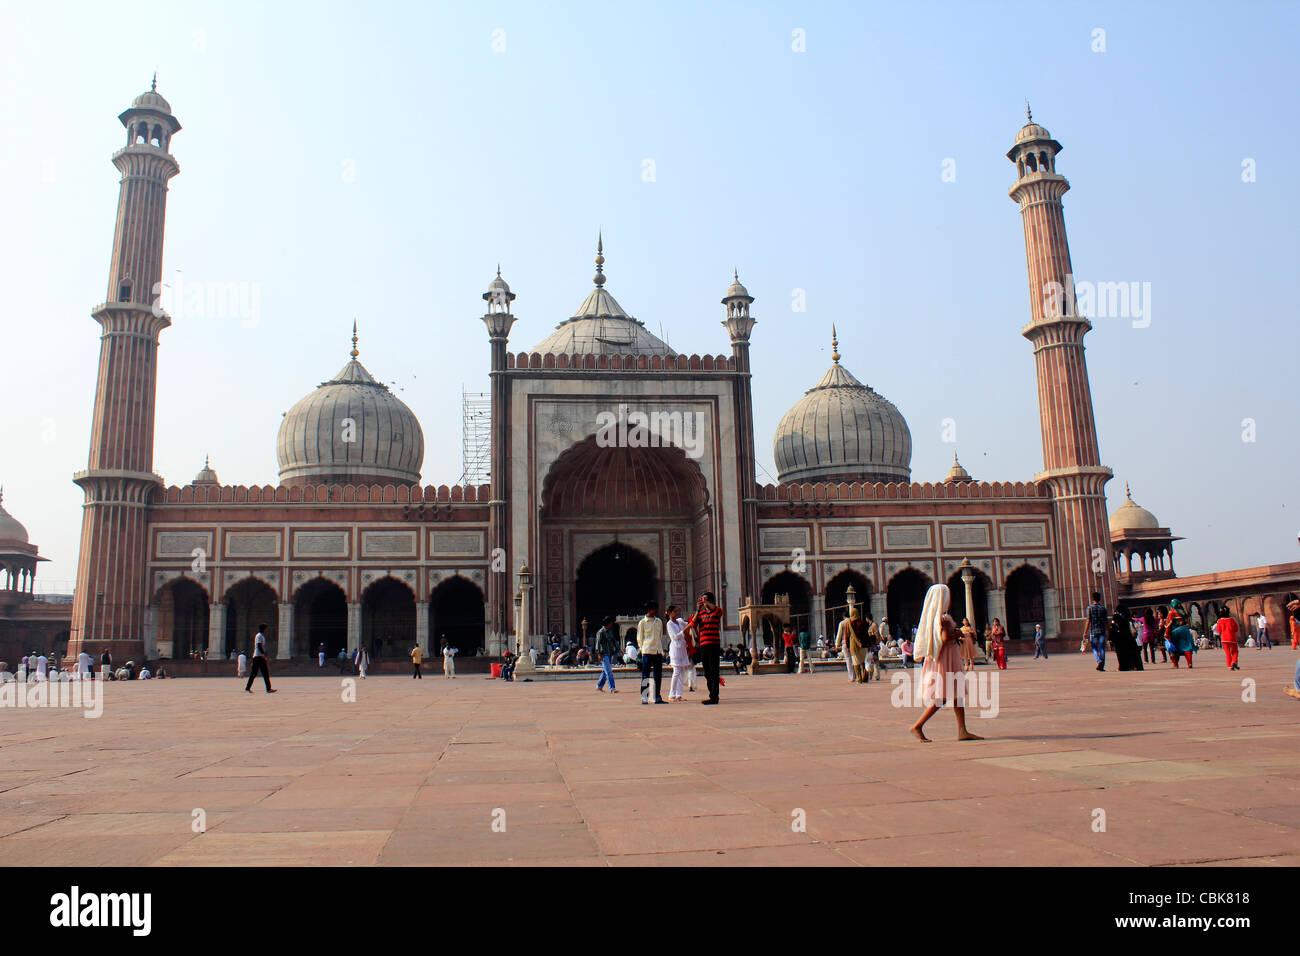 The juma masjid, Old Delhi, India - Stock Image